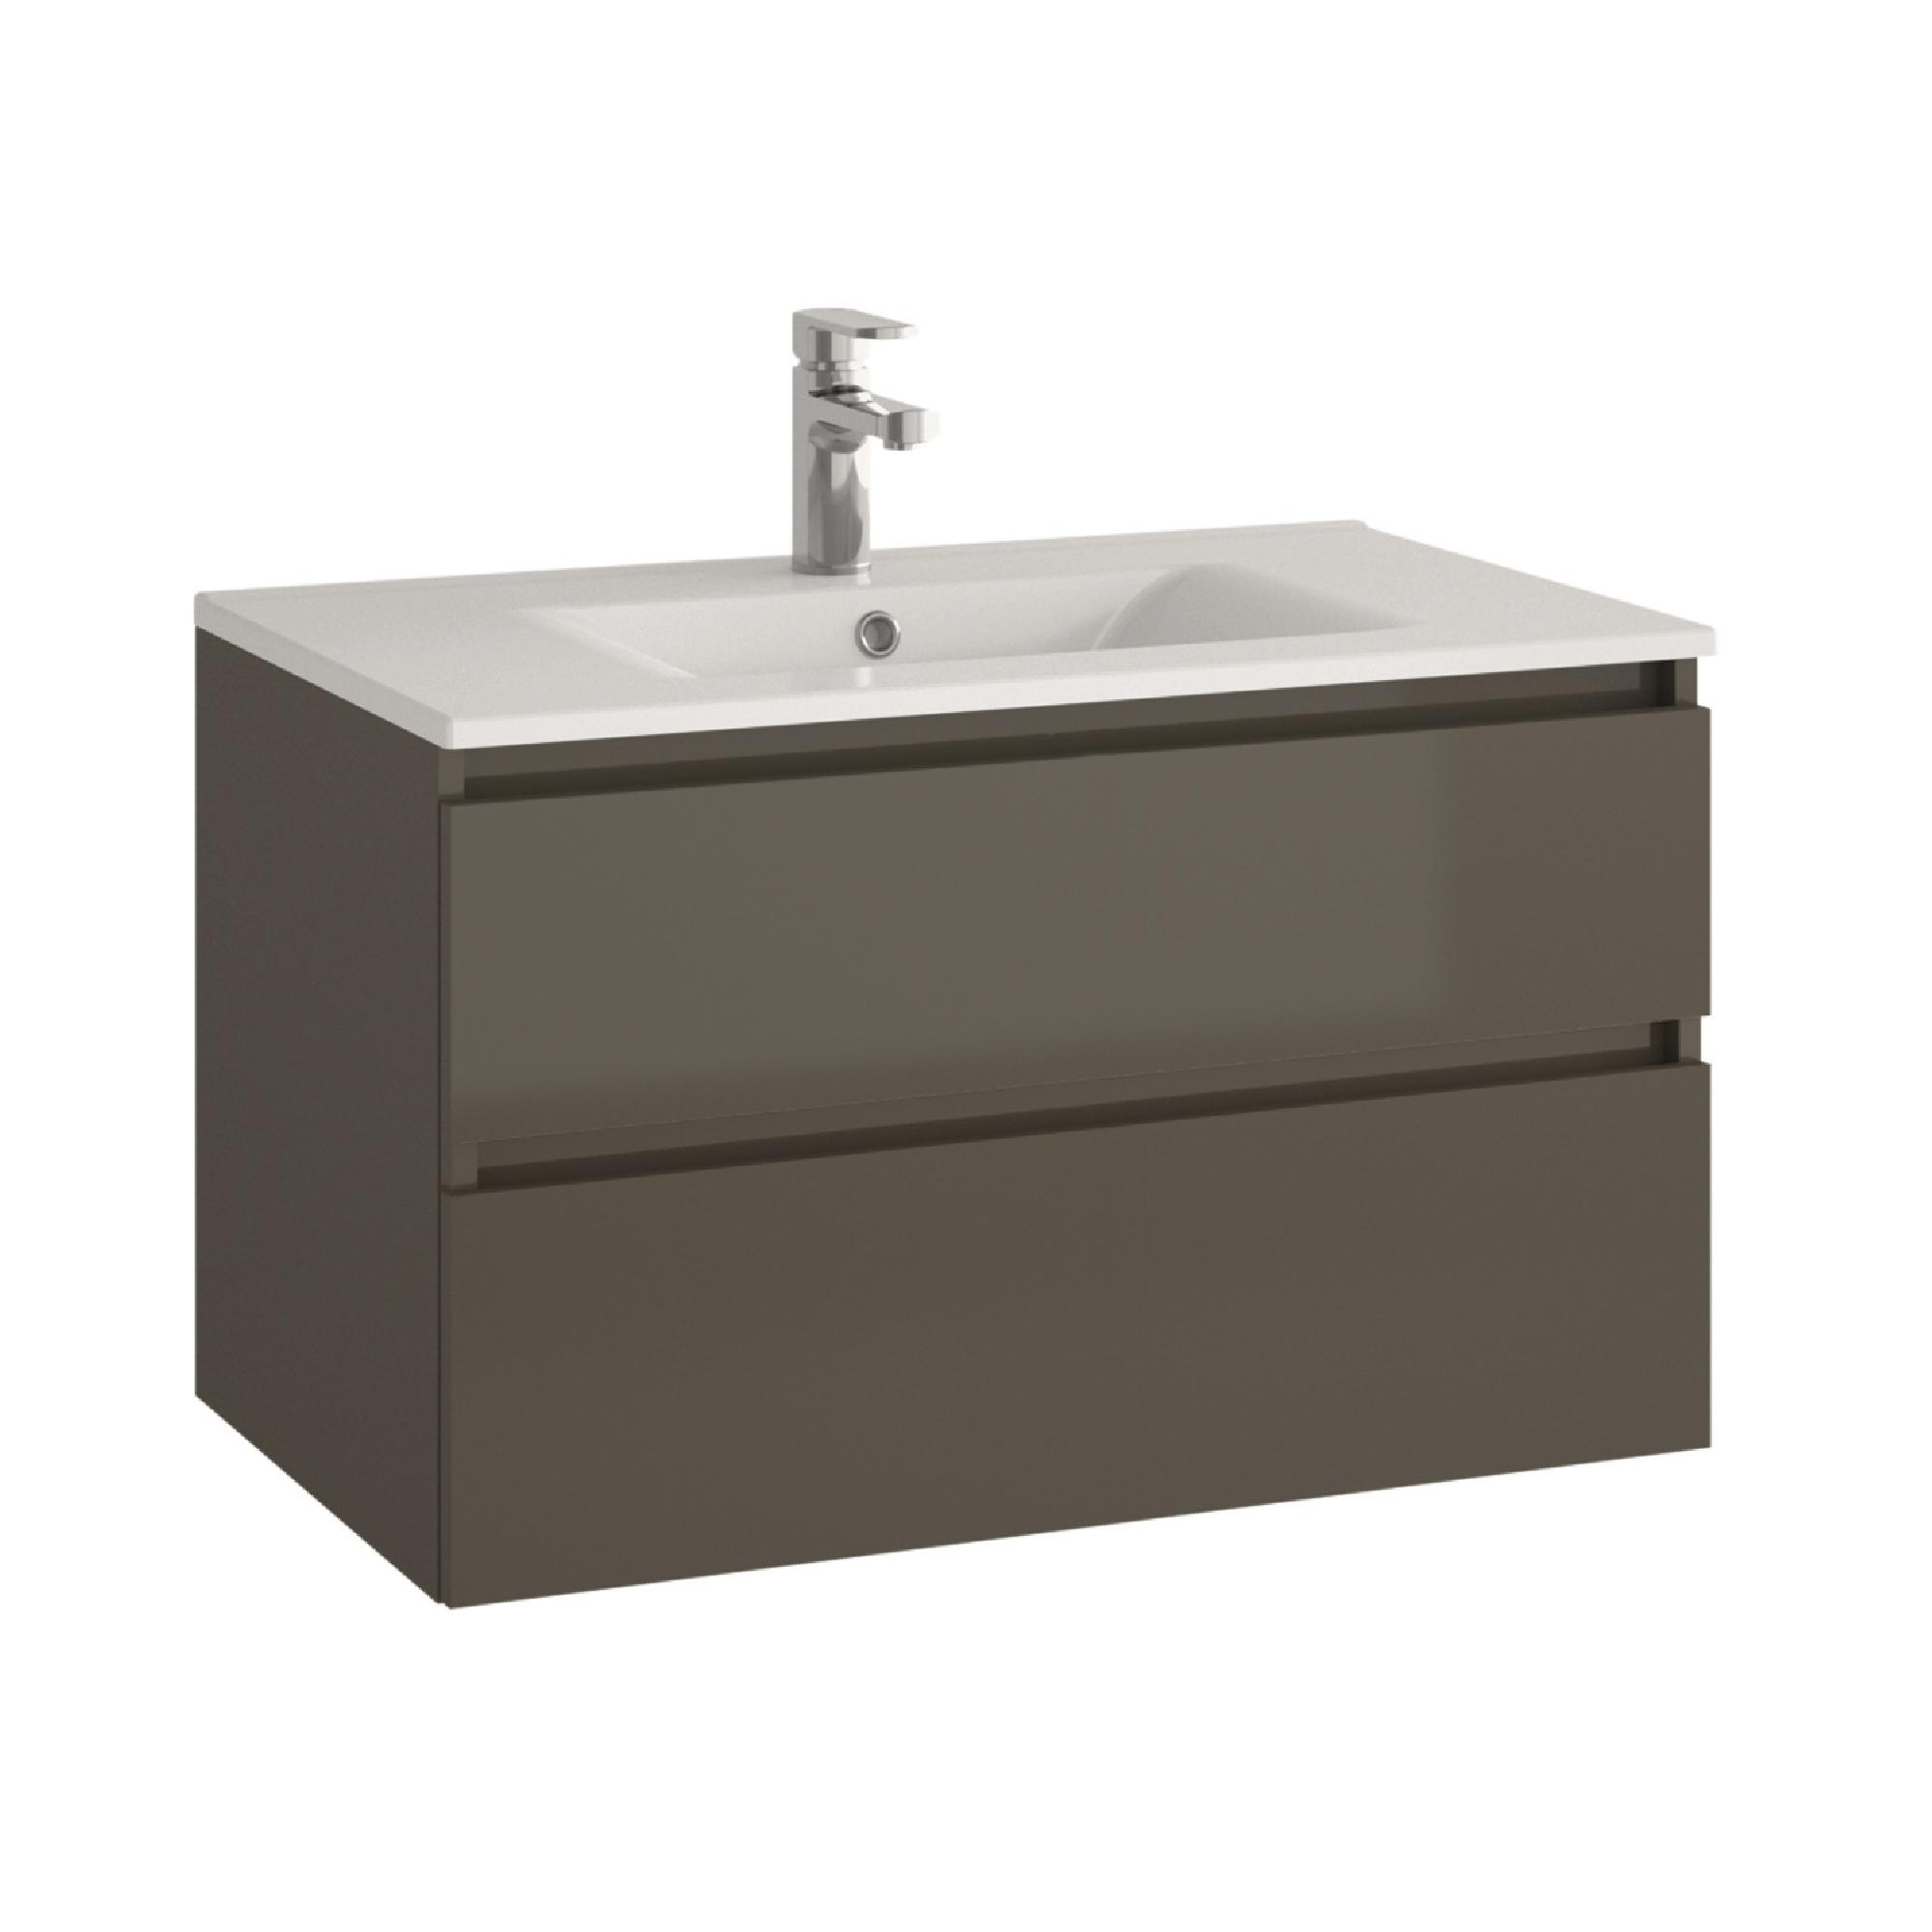 allibert badm bel badm belset vormontiert grau spiegelschrank waschtisch 80 cm ebay. Black Bedroom Furniture Sets. Home Design Ideas